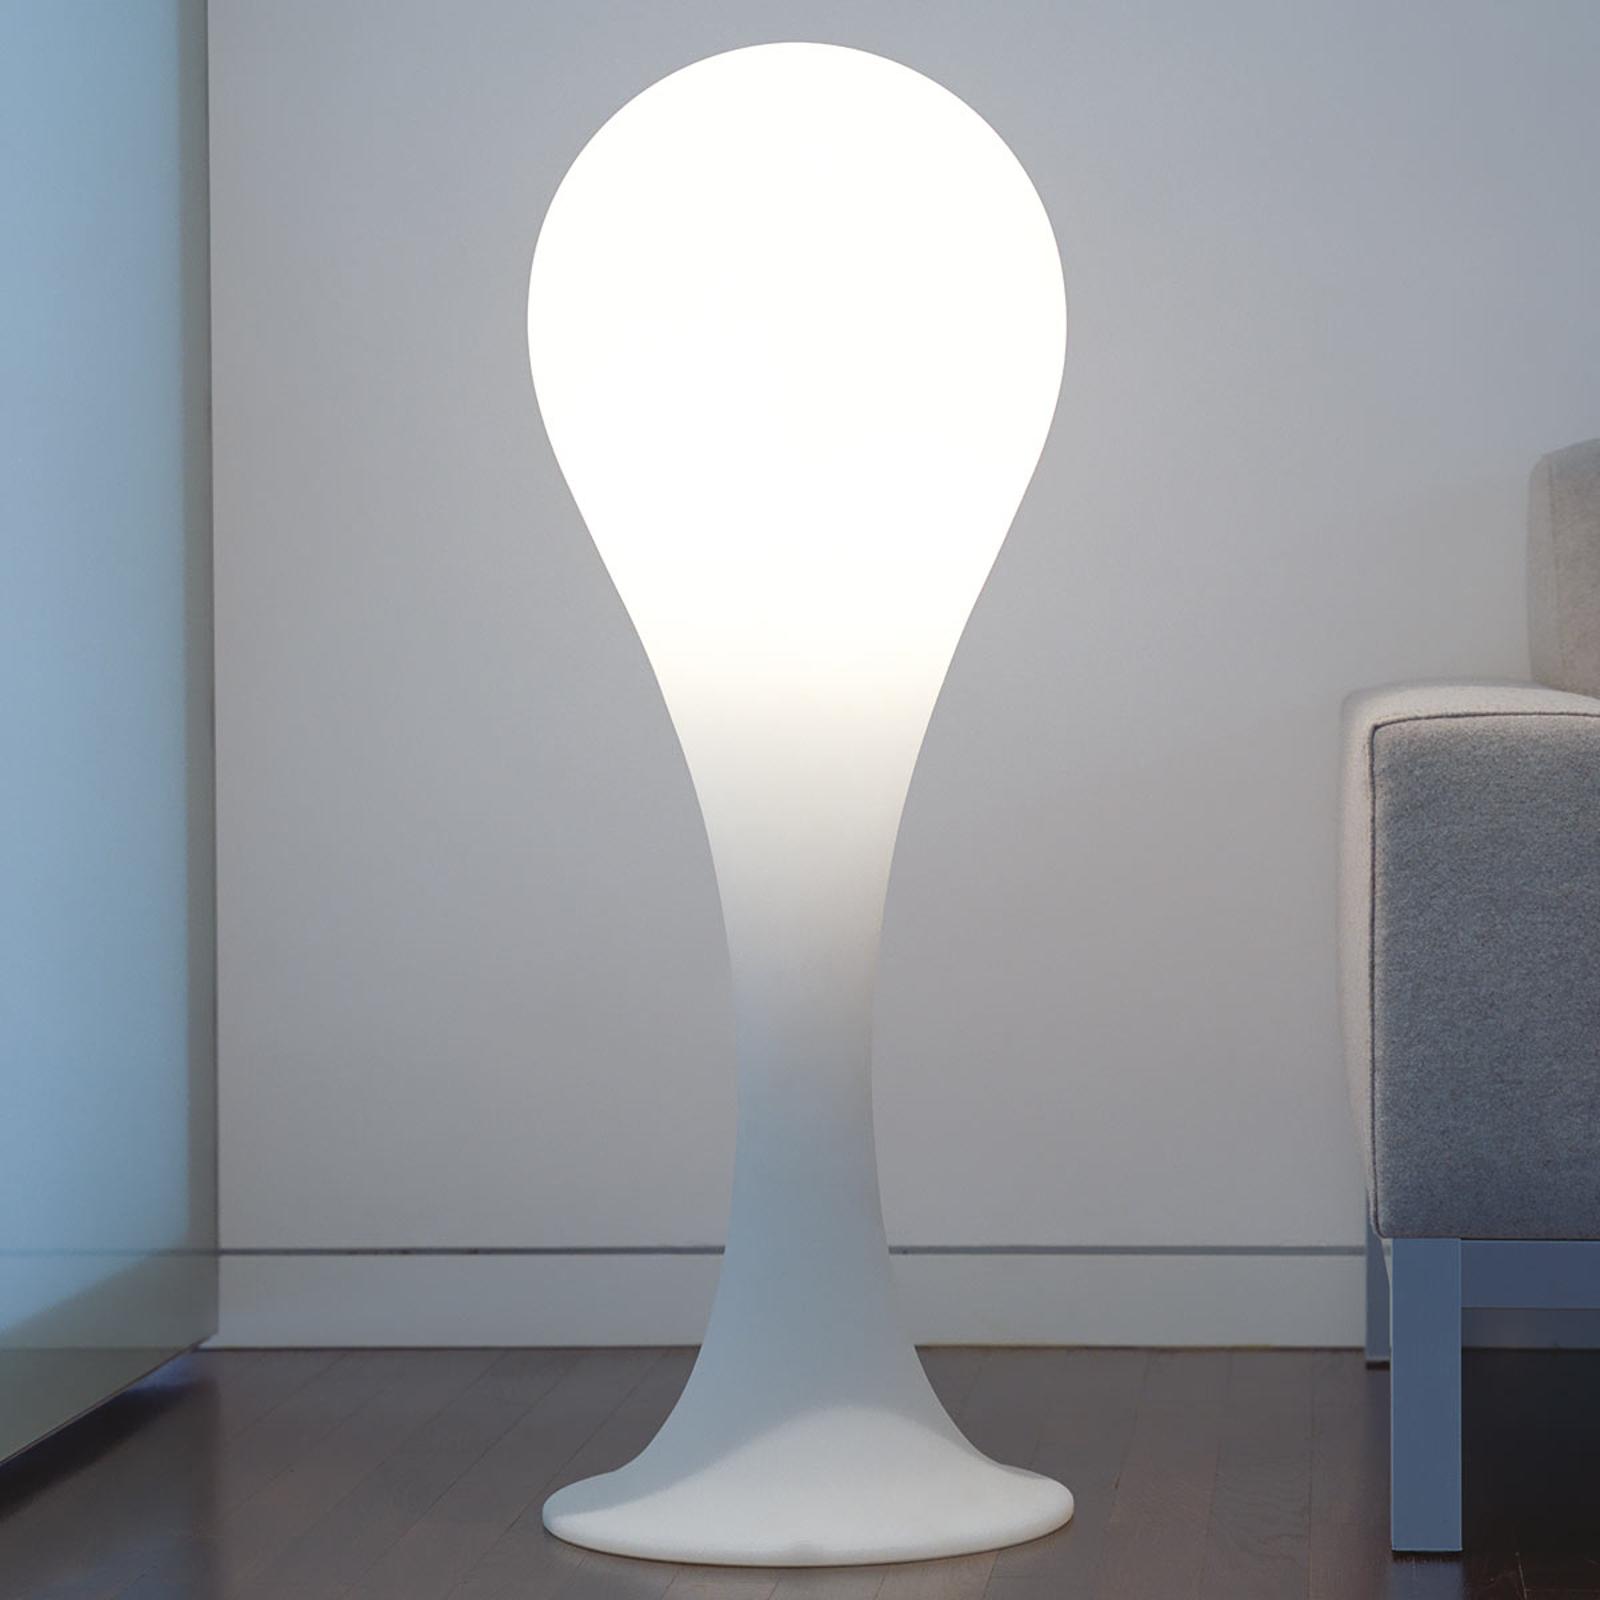 next Drop_4 - designer-gulvlampe i dråbeform